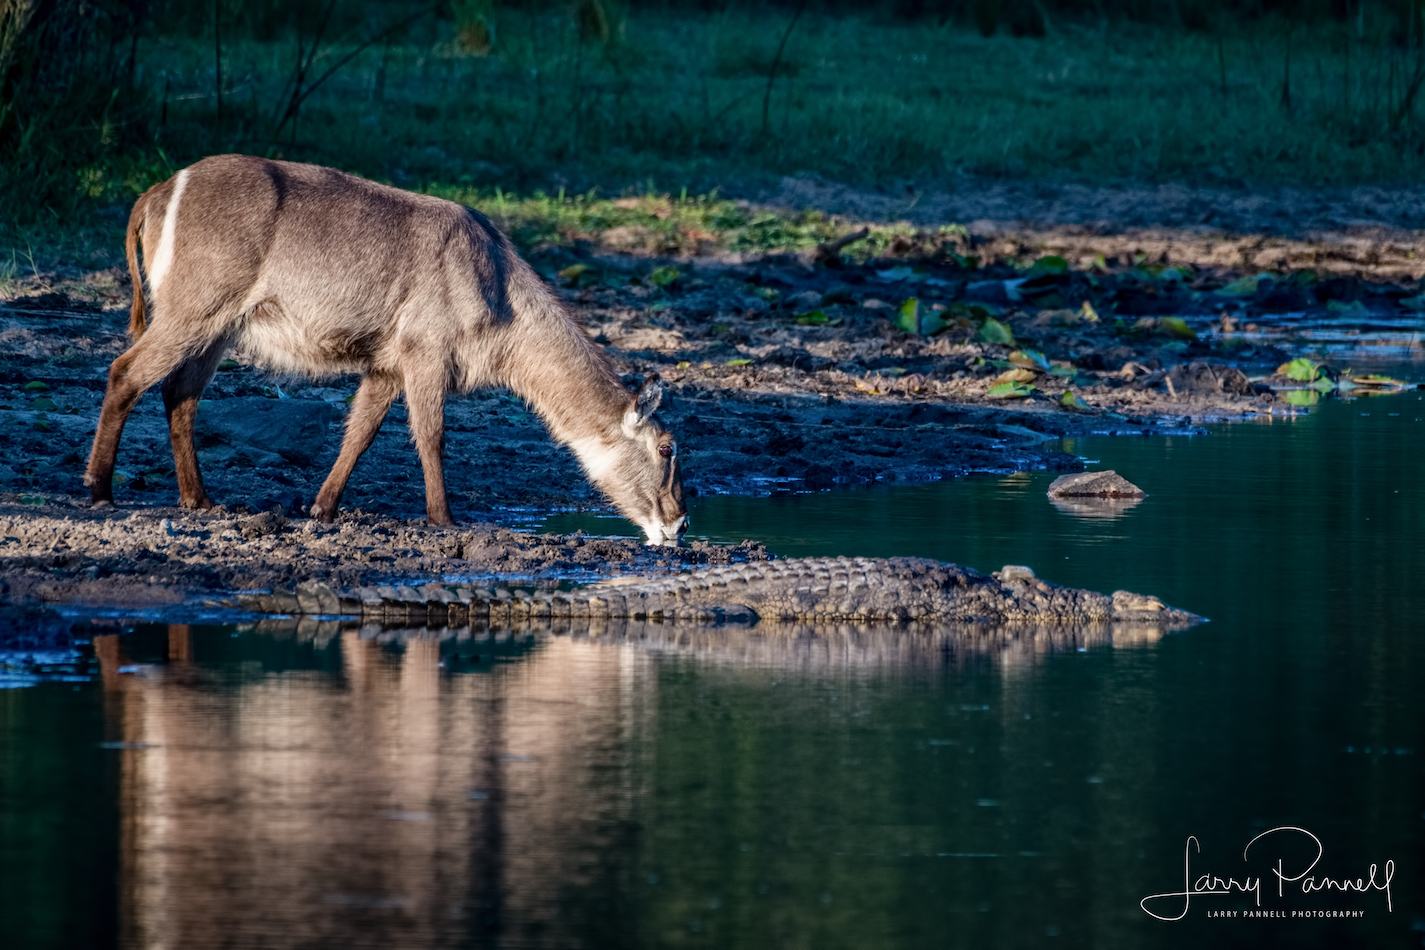 waterbok_croc_kruger1 copy